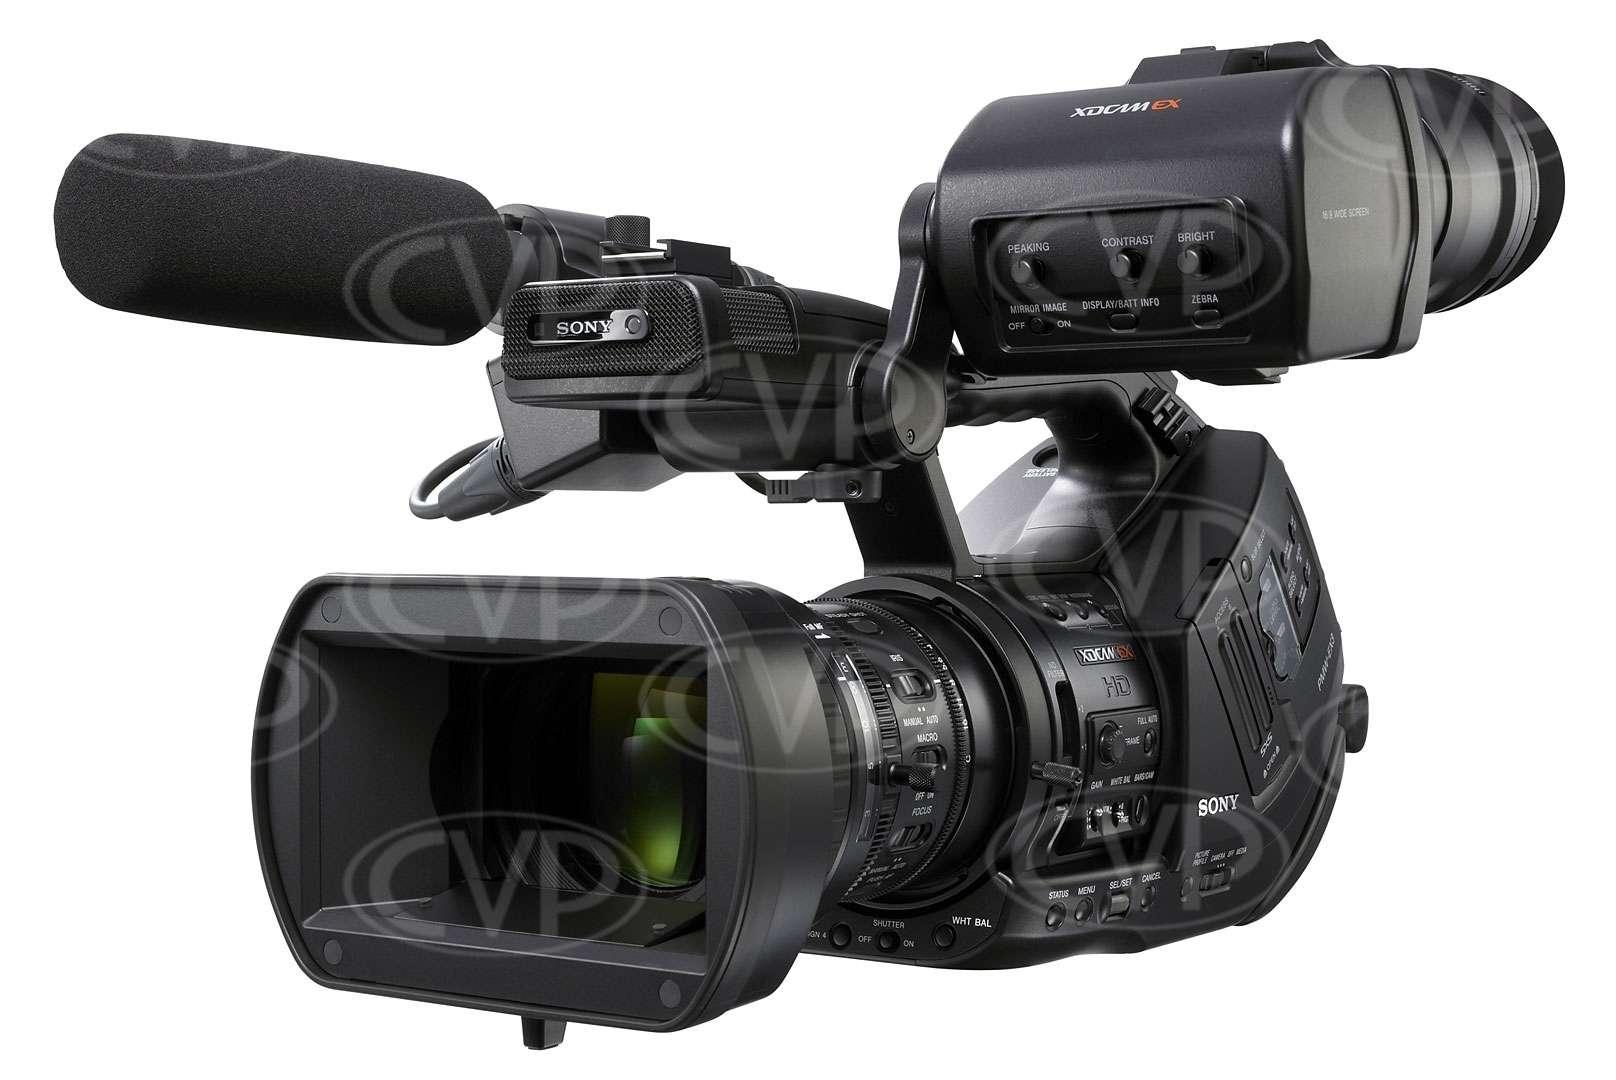 buy sony pmw ex3 pmwex3 pmw ex3 4 pmwex3 4 full hd 3 cmos rh cvp com Sony EX3 Costs sony ex3 camera user manual